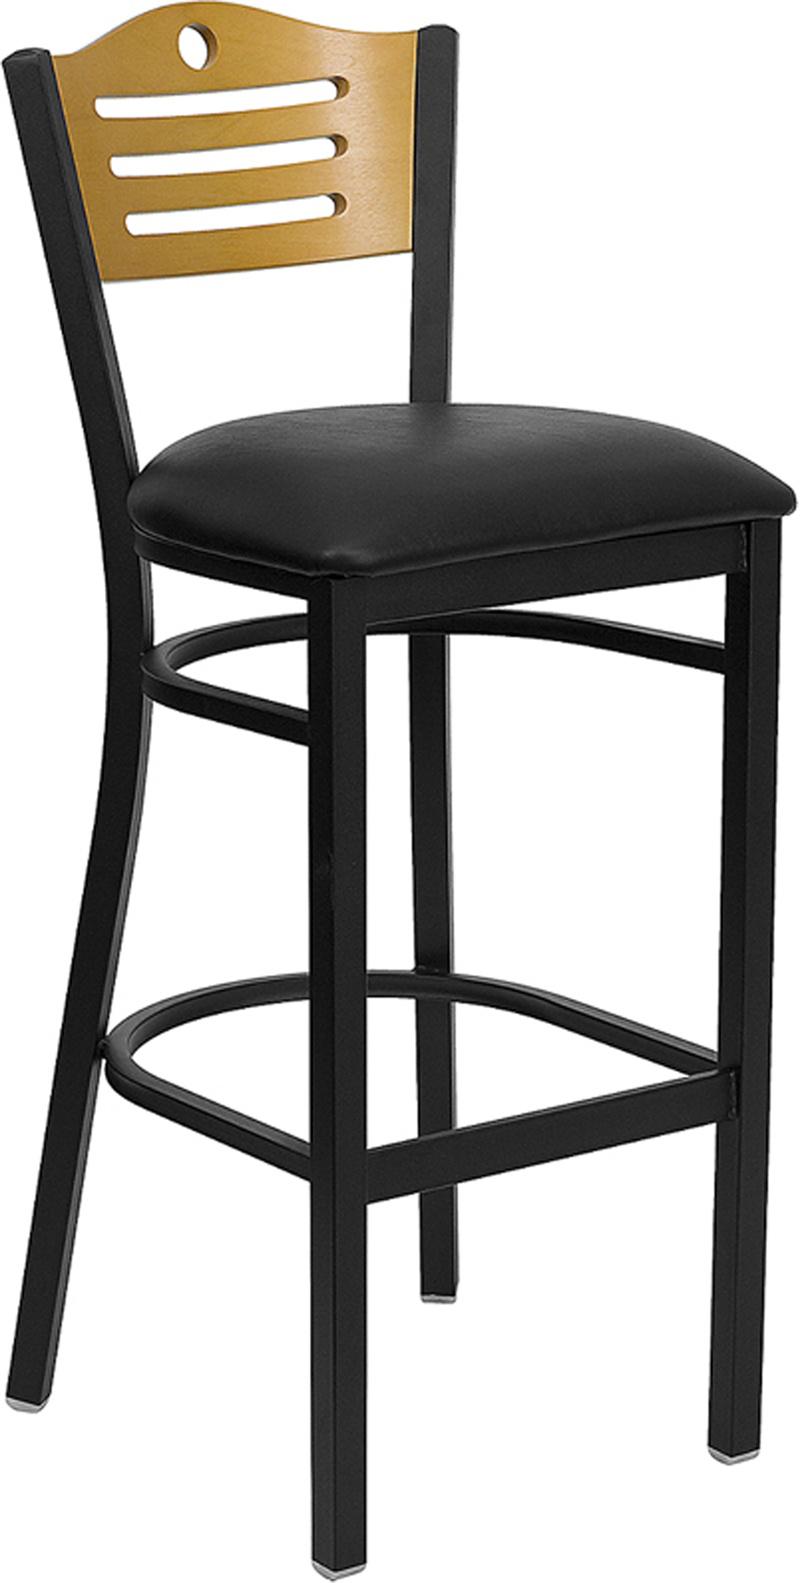 Metal Restaurant Bar Stool, Wood Back, Vinyl Seat